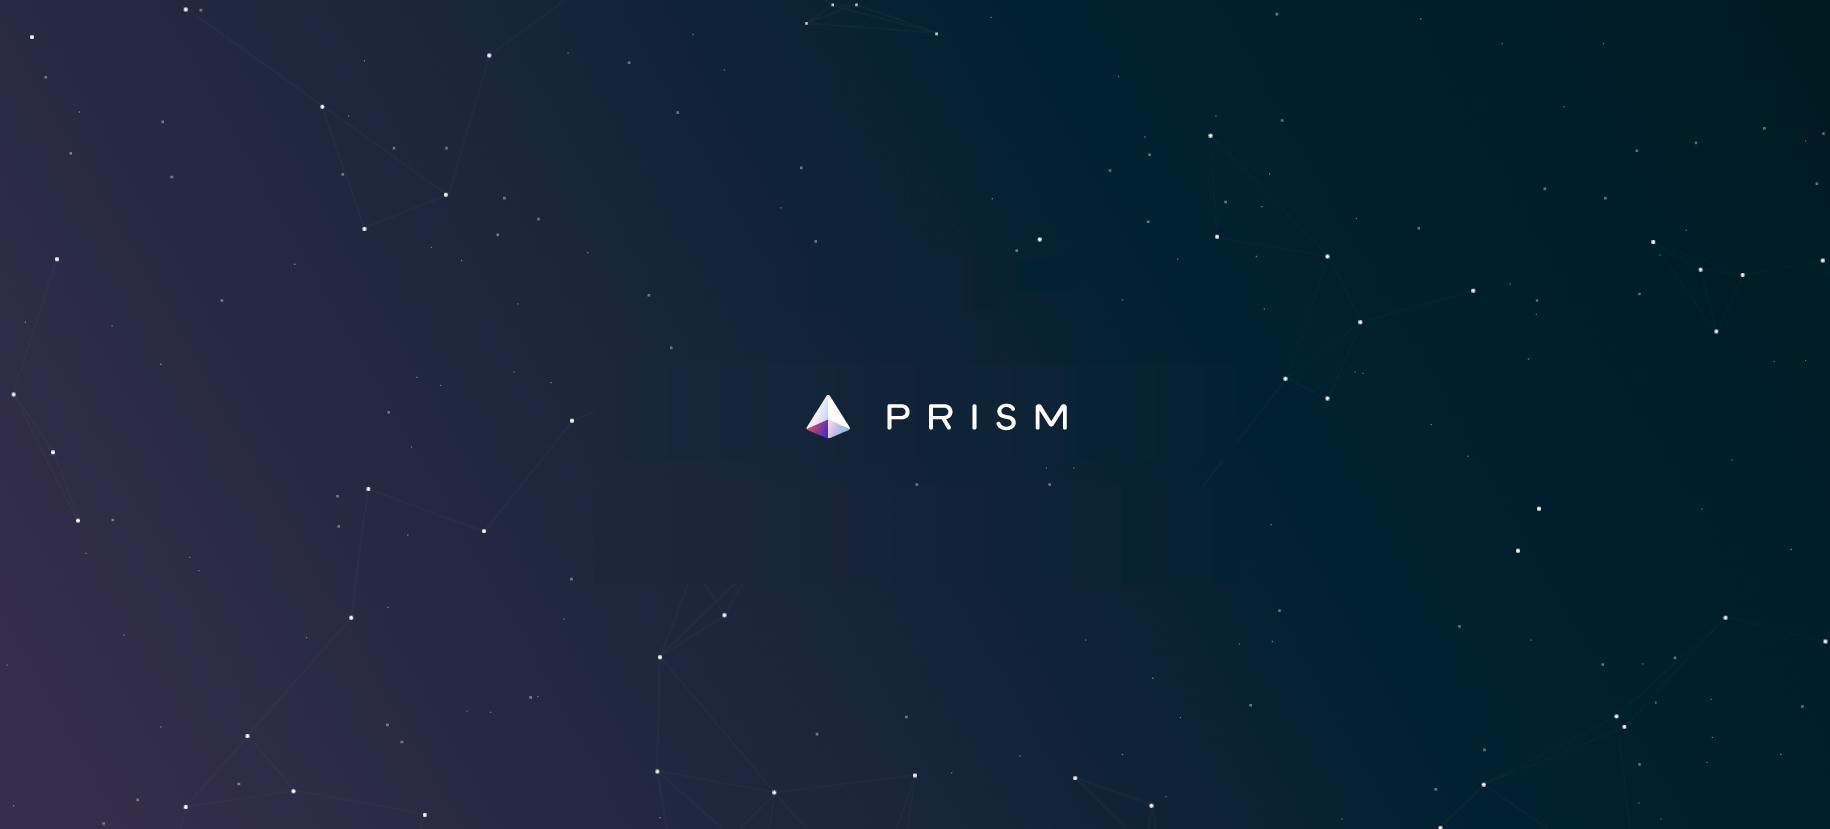 Prism_7